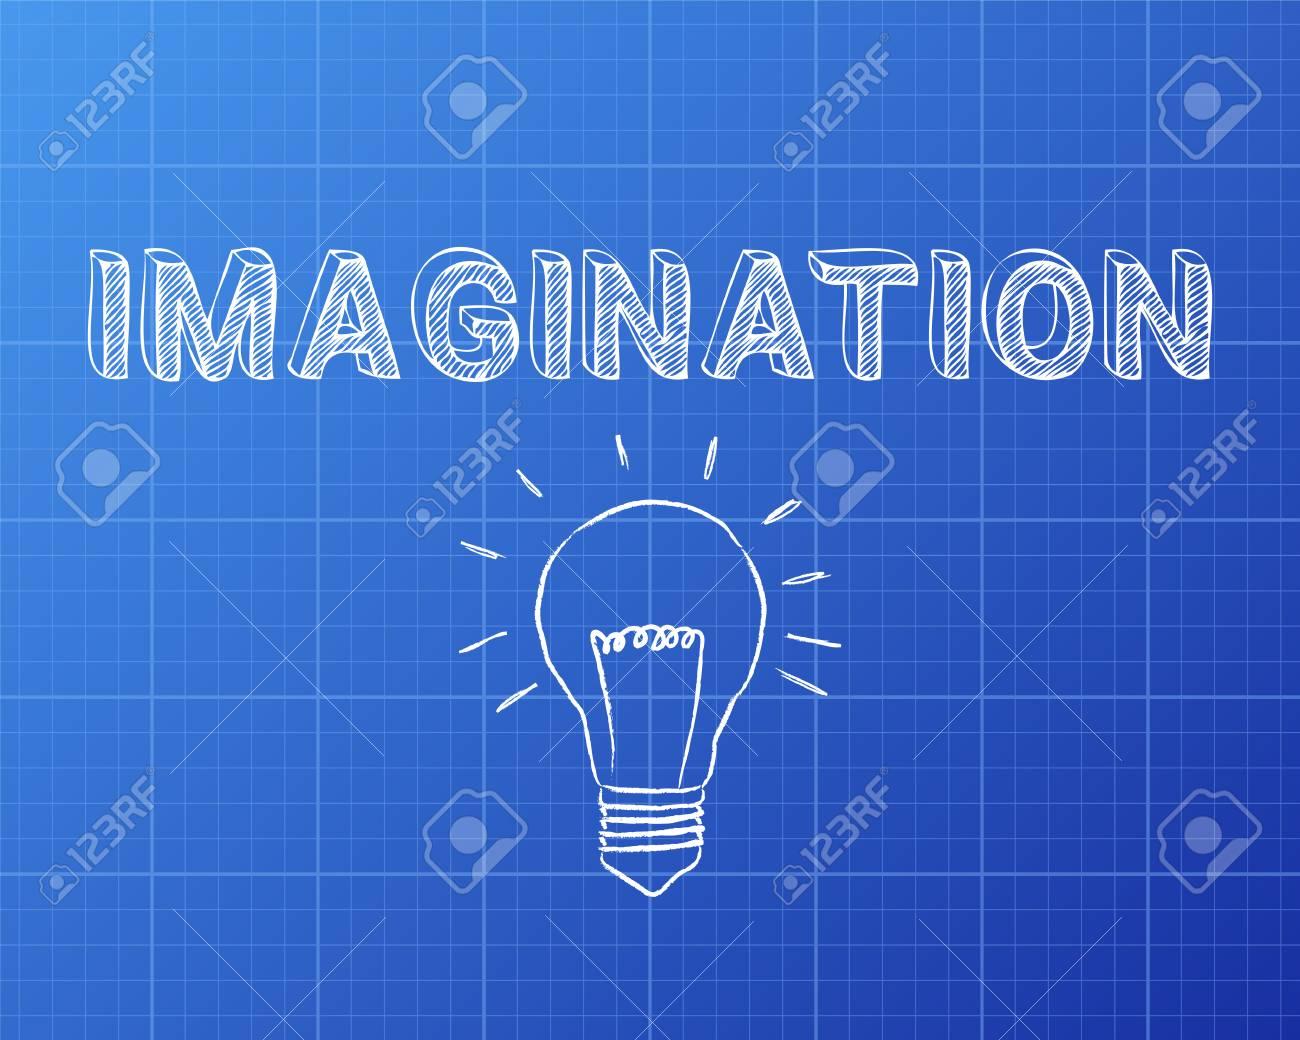 Hand drawn imagination sign and lightbulb on blueprint background hand drawn imagination sign and lightbulb on blueprint background stock vector 75197179 malvernweather Images